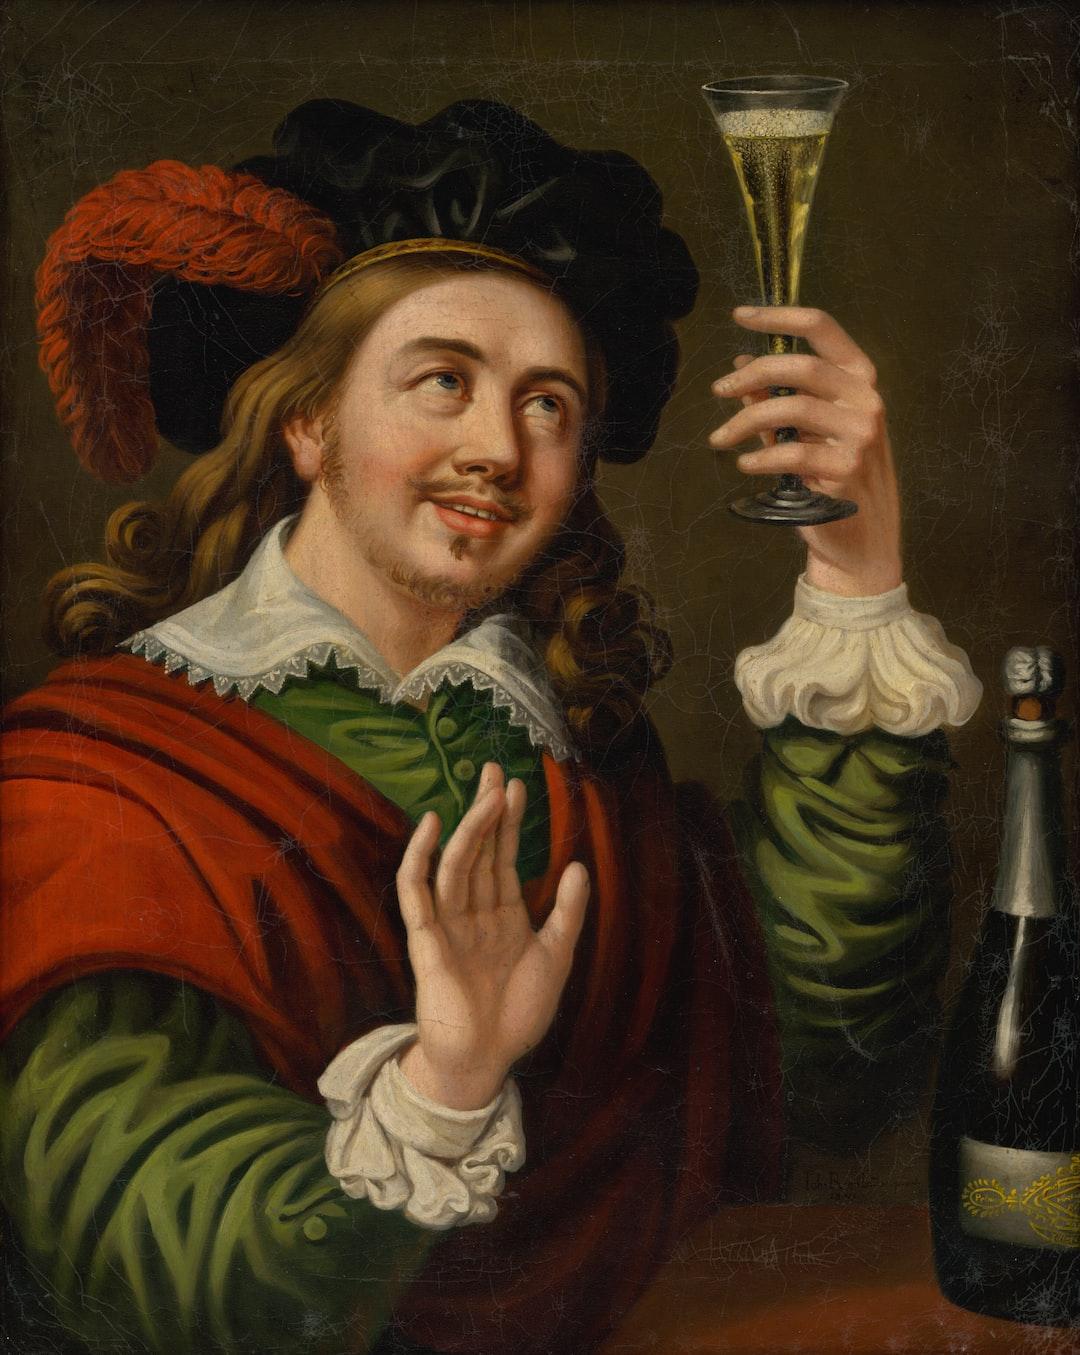 Cheers! Creator Ján Rombauer, Circa 1841. Institution: Slovak National Gallery Provider: Slovak National Gallery Providing Country: Slovakia PD for Public Domain Mark